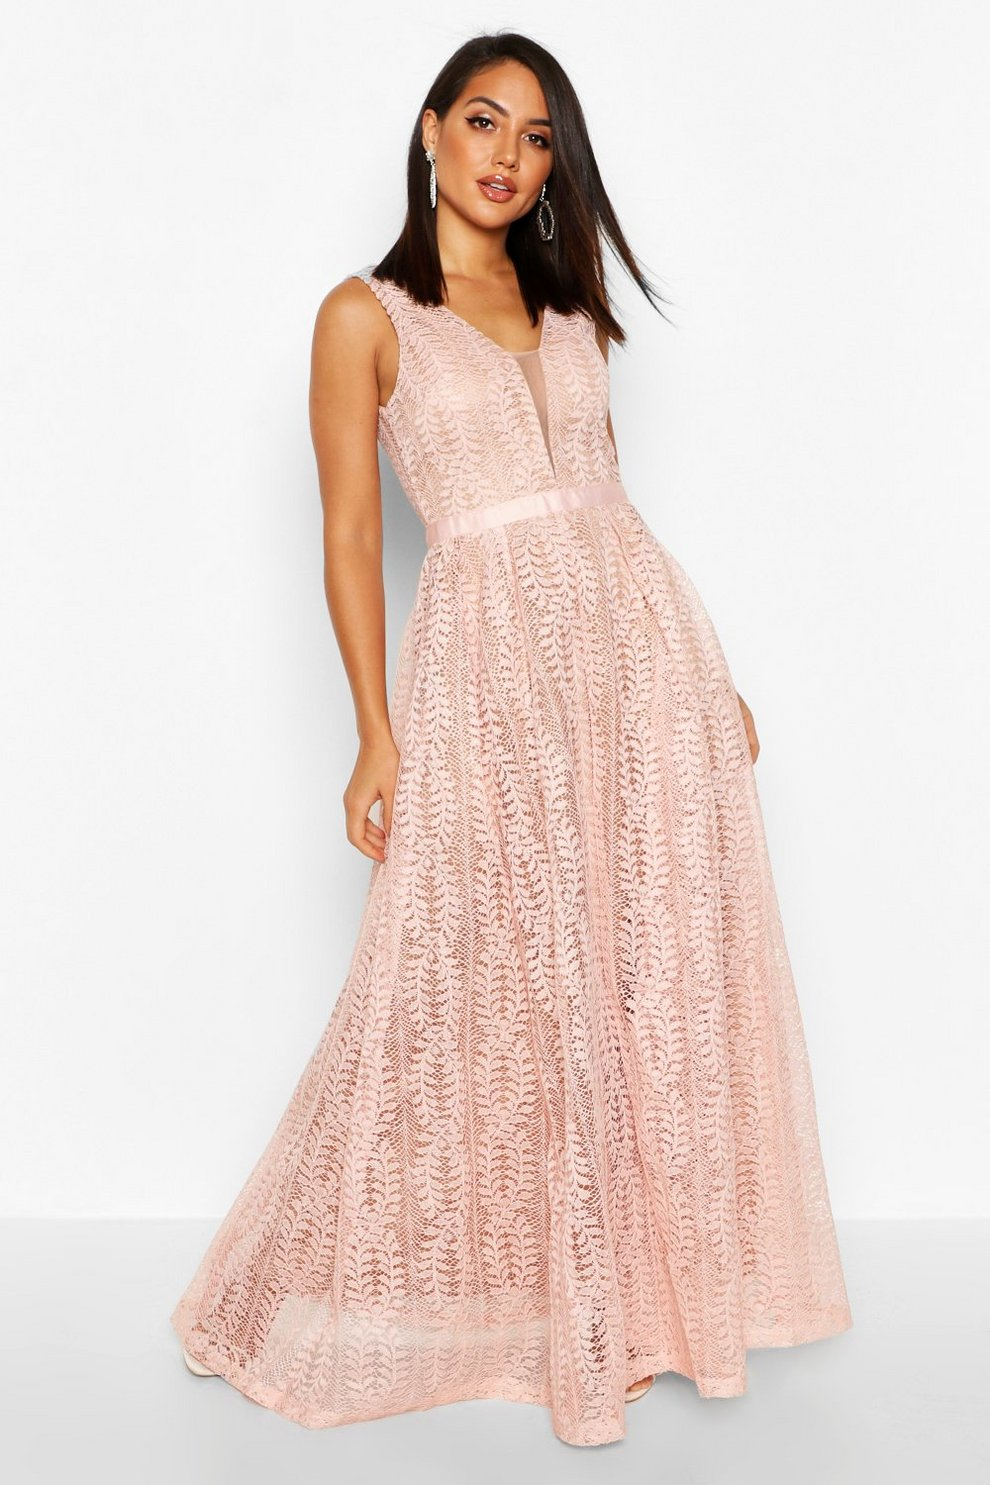 Form fitting white maxi dress